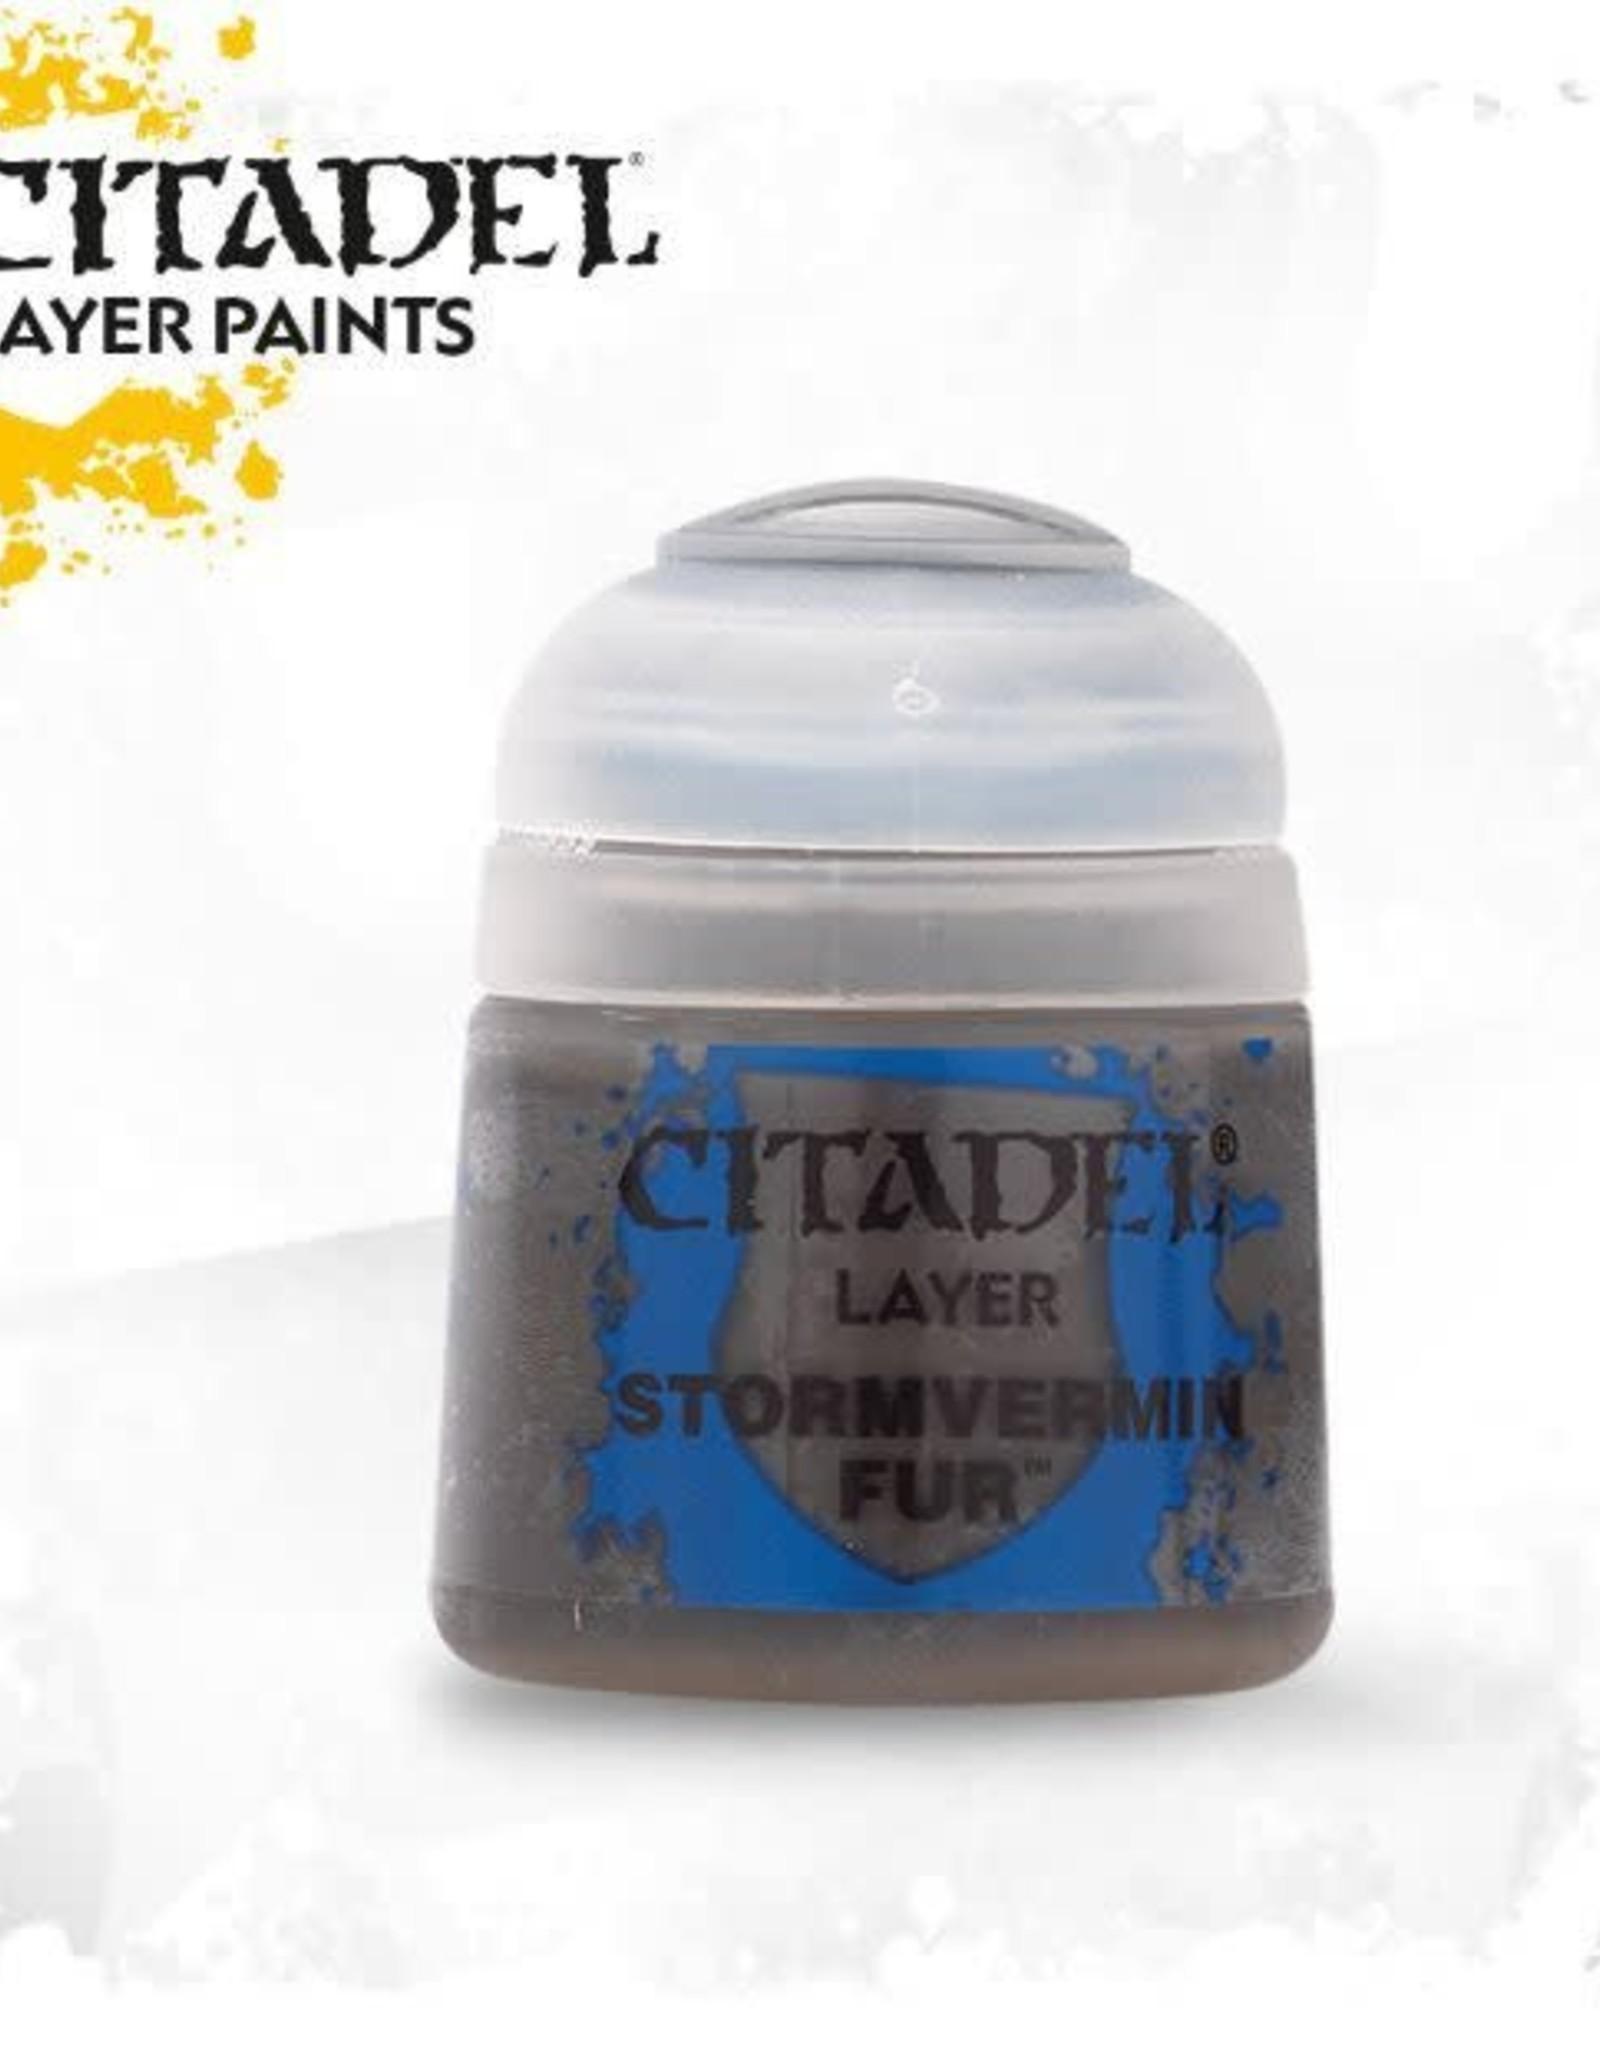 Games Workshop Citadel Paint: Layer - Stormvermin Fur